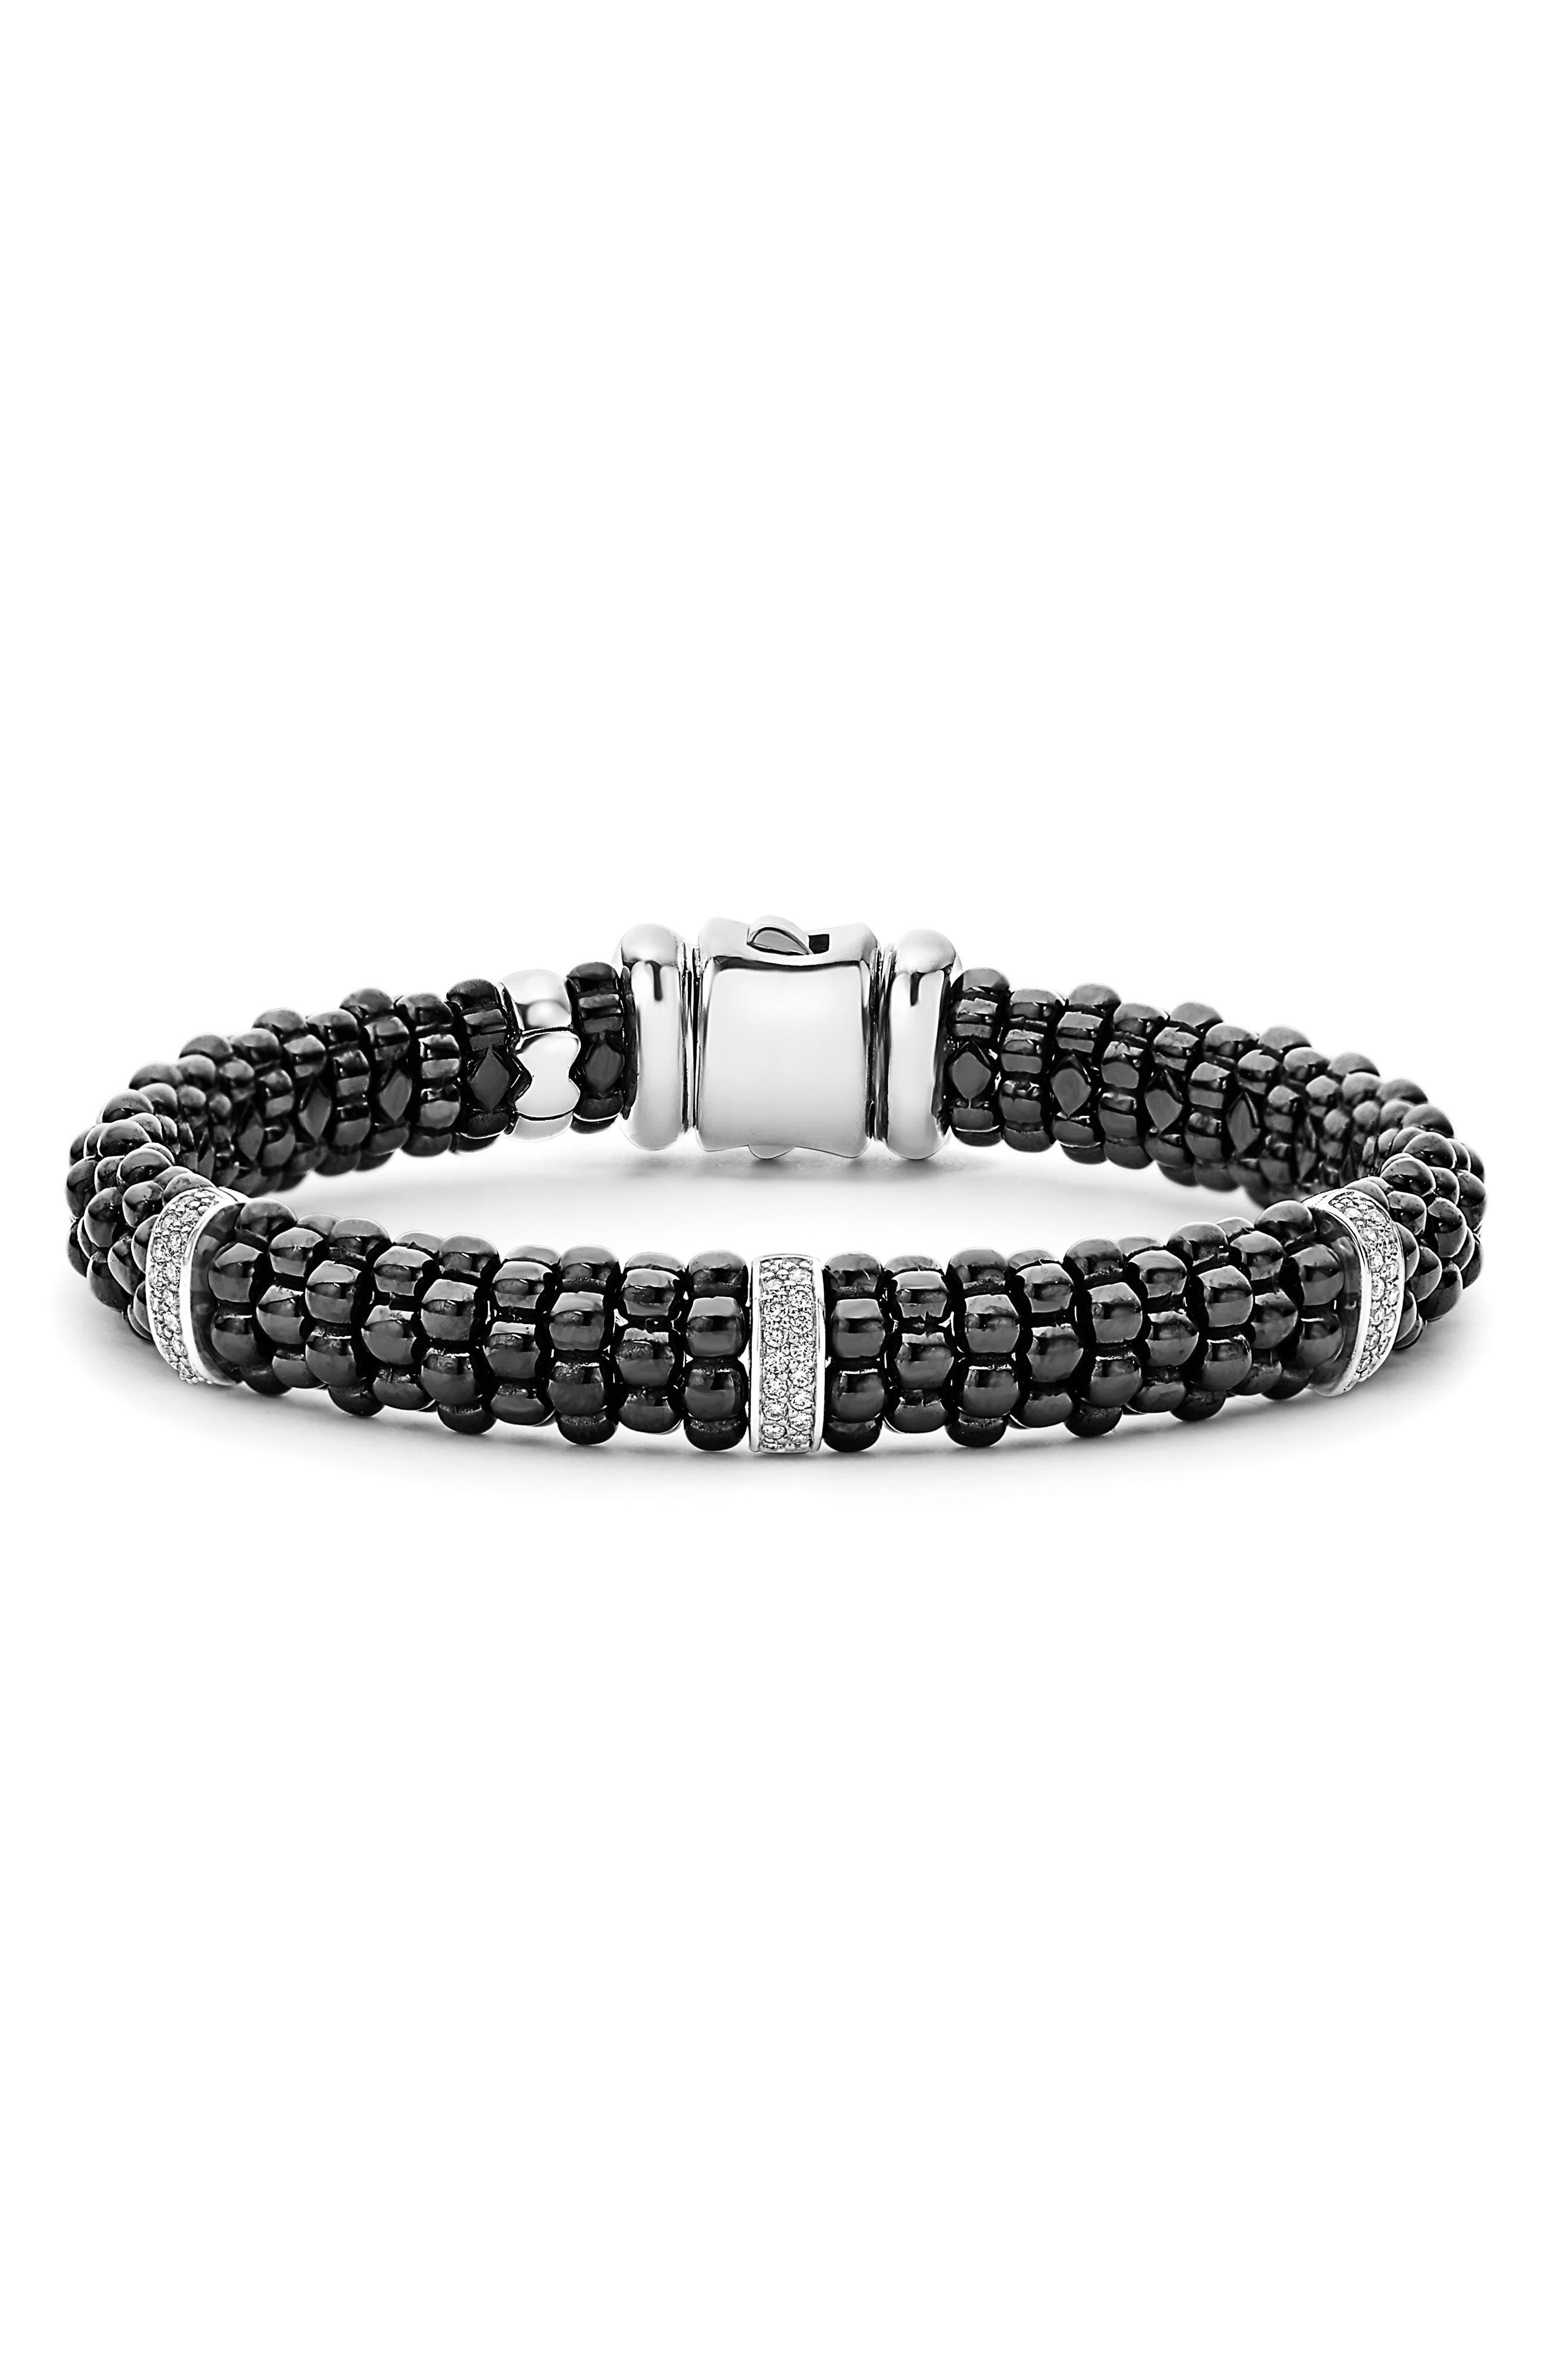 Black Caviar Diamond Bracelet,                         Main,                         color, BLACK/ SILVER